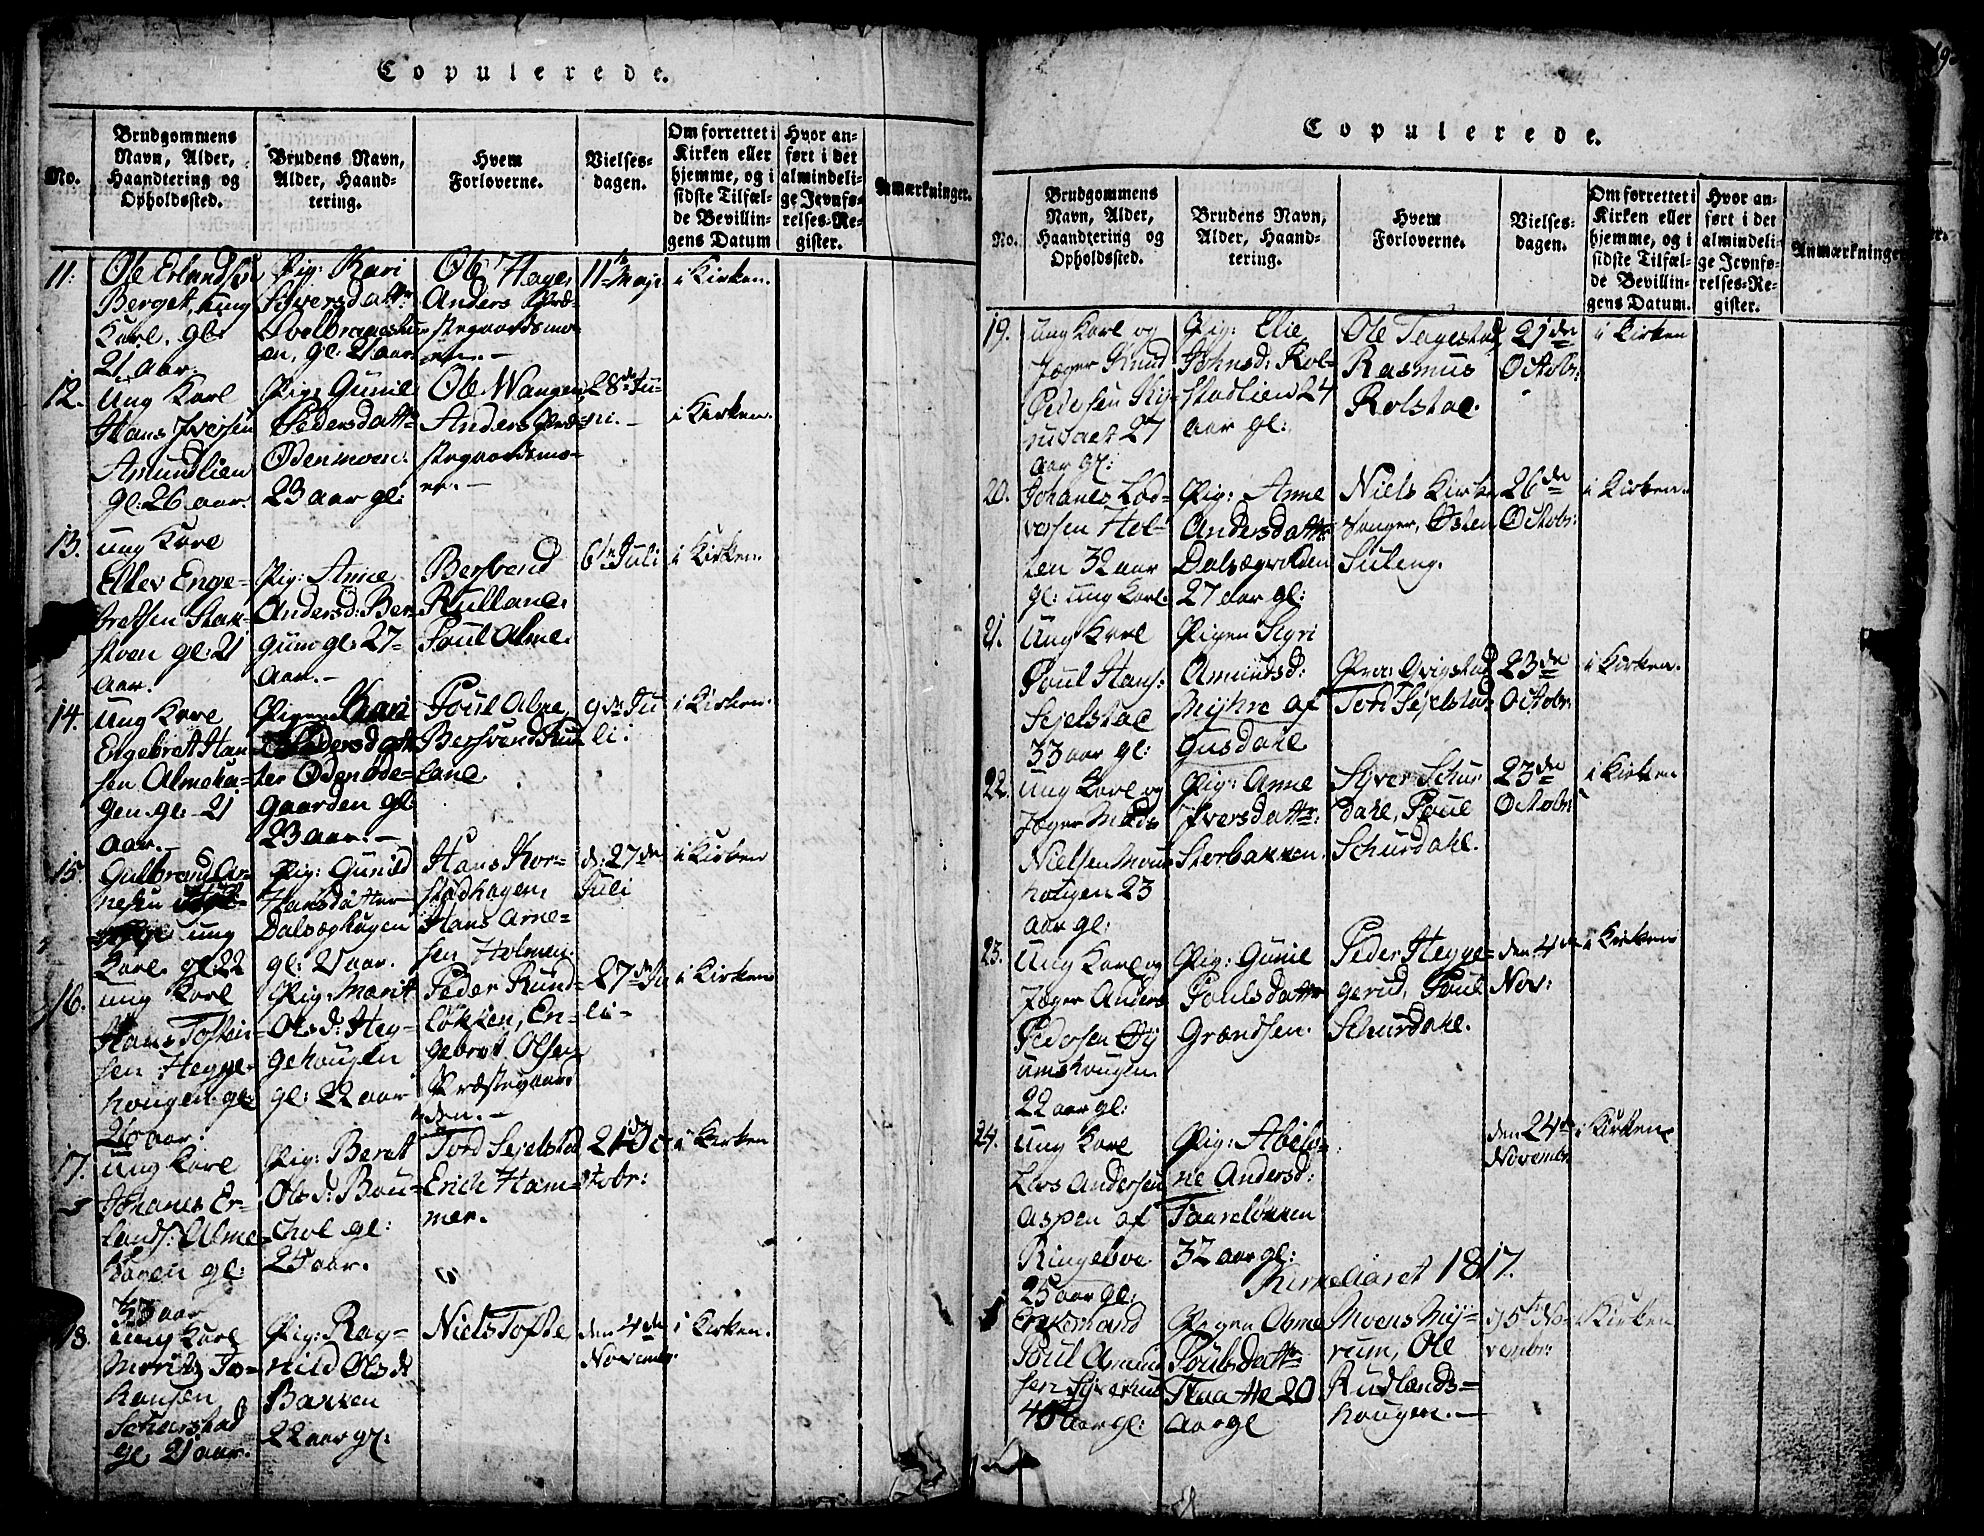 SAH, Fron prestekontor, H/Ha/Hab/L0001: Klokkerbok nr. 1, 1816-1843, s. 191